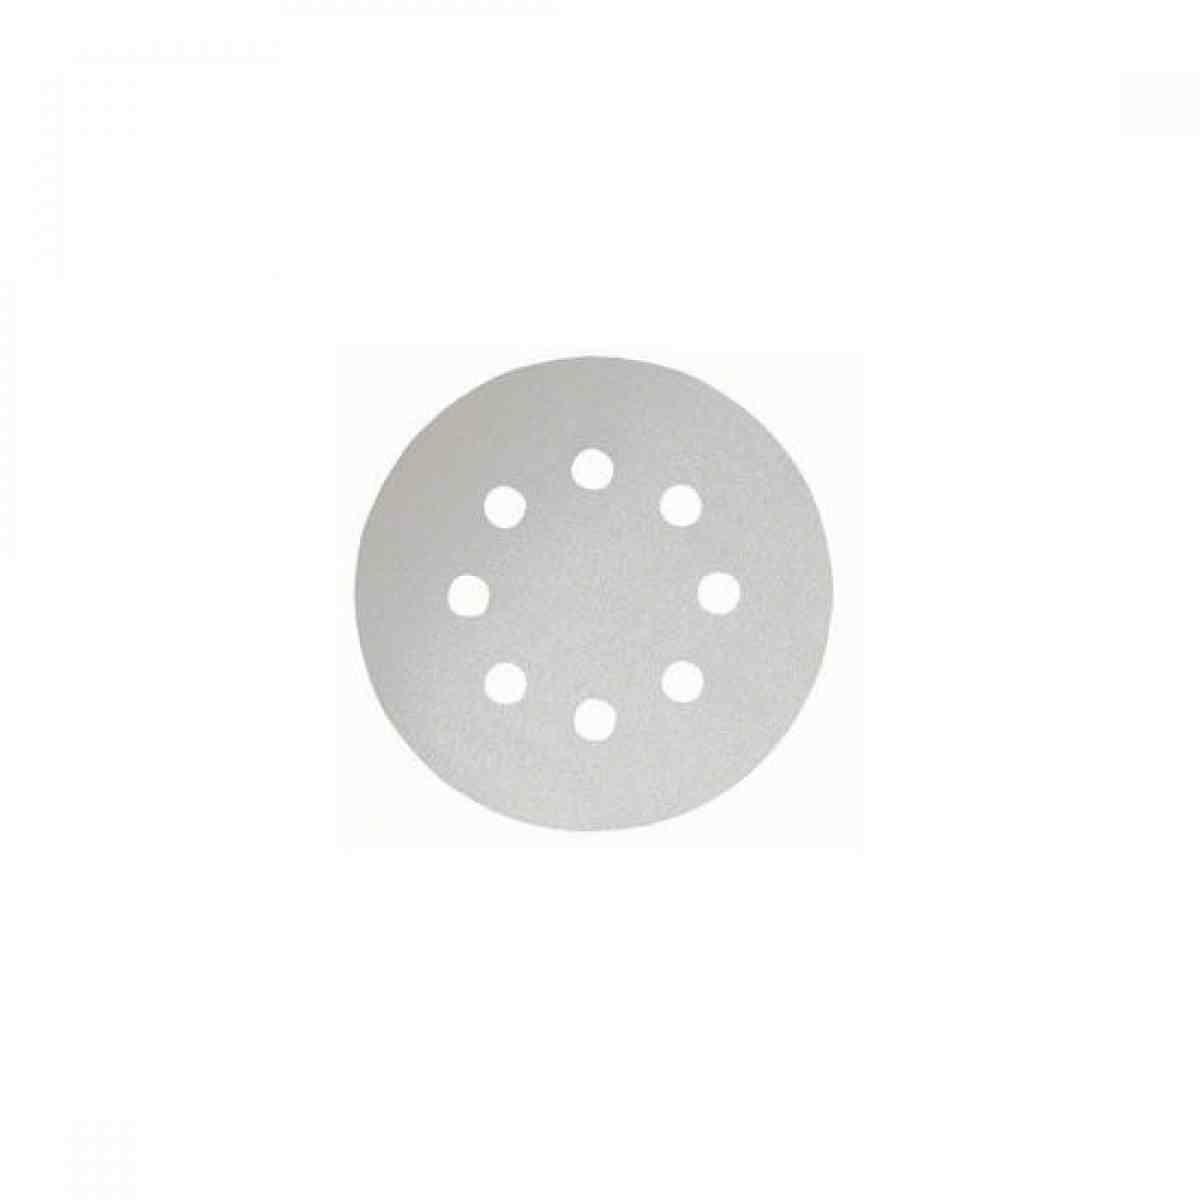 "Lixa Disco Velcro Tinta/Vern 5"" G320 8F 5Pçs Best For Paint Bosch"